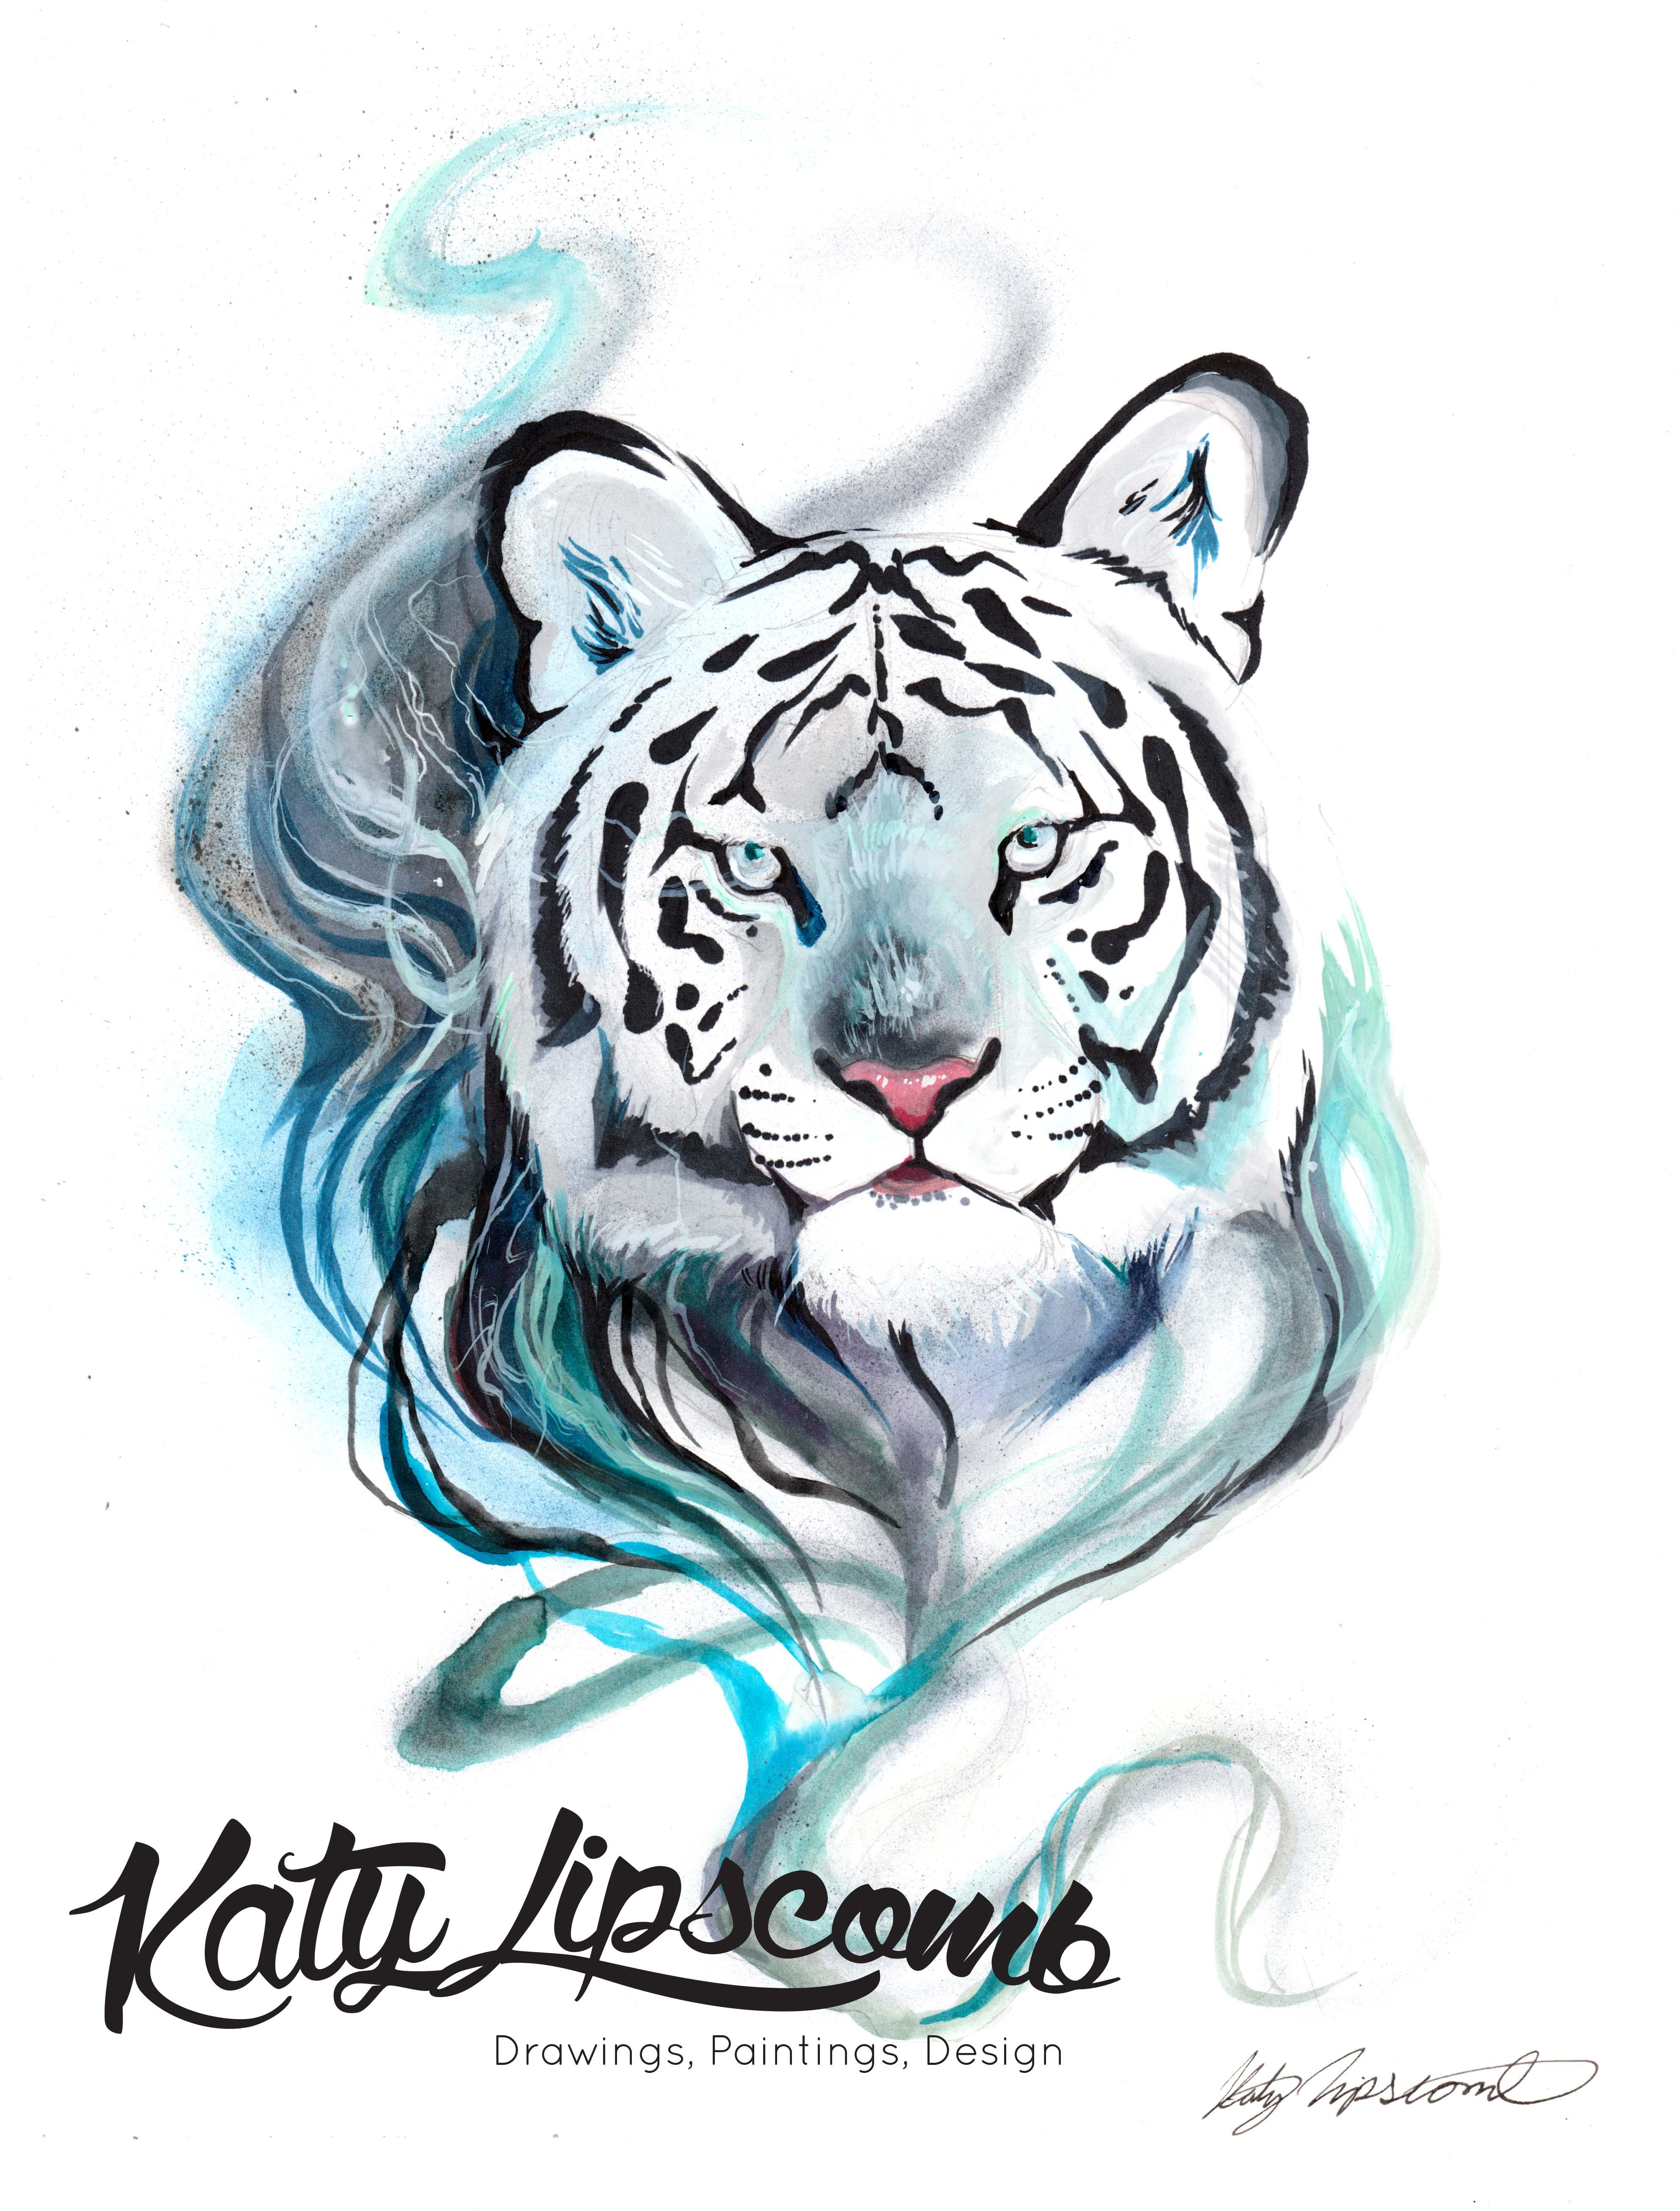 smokey tiger print katy lipscomb online store powered by storenvy